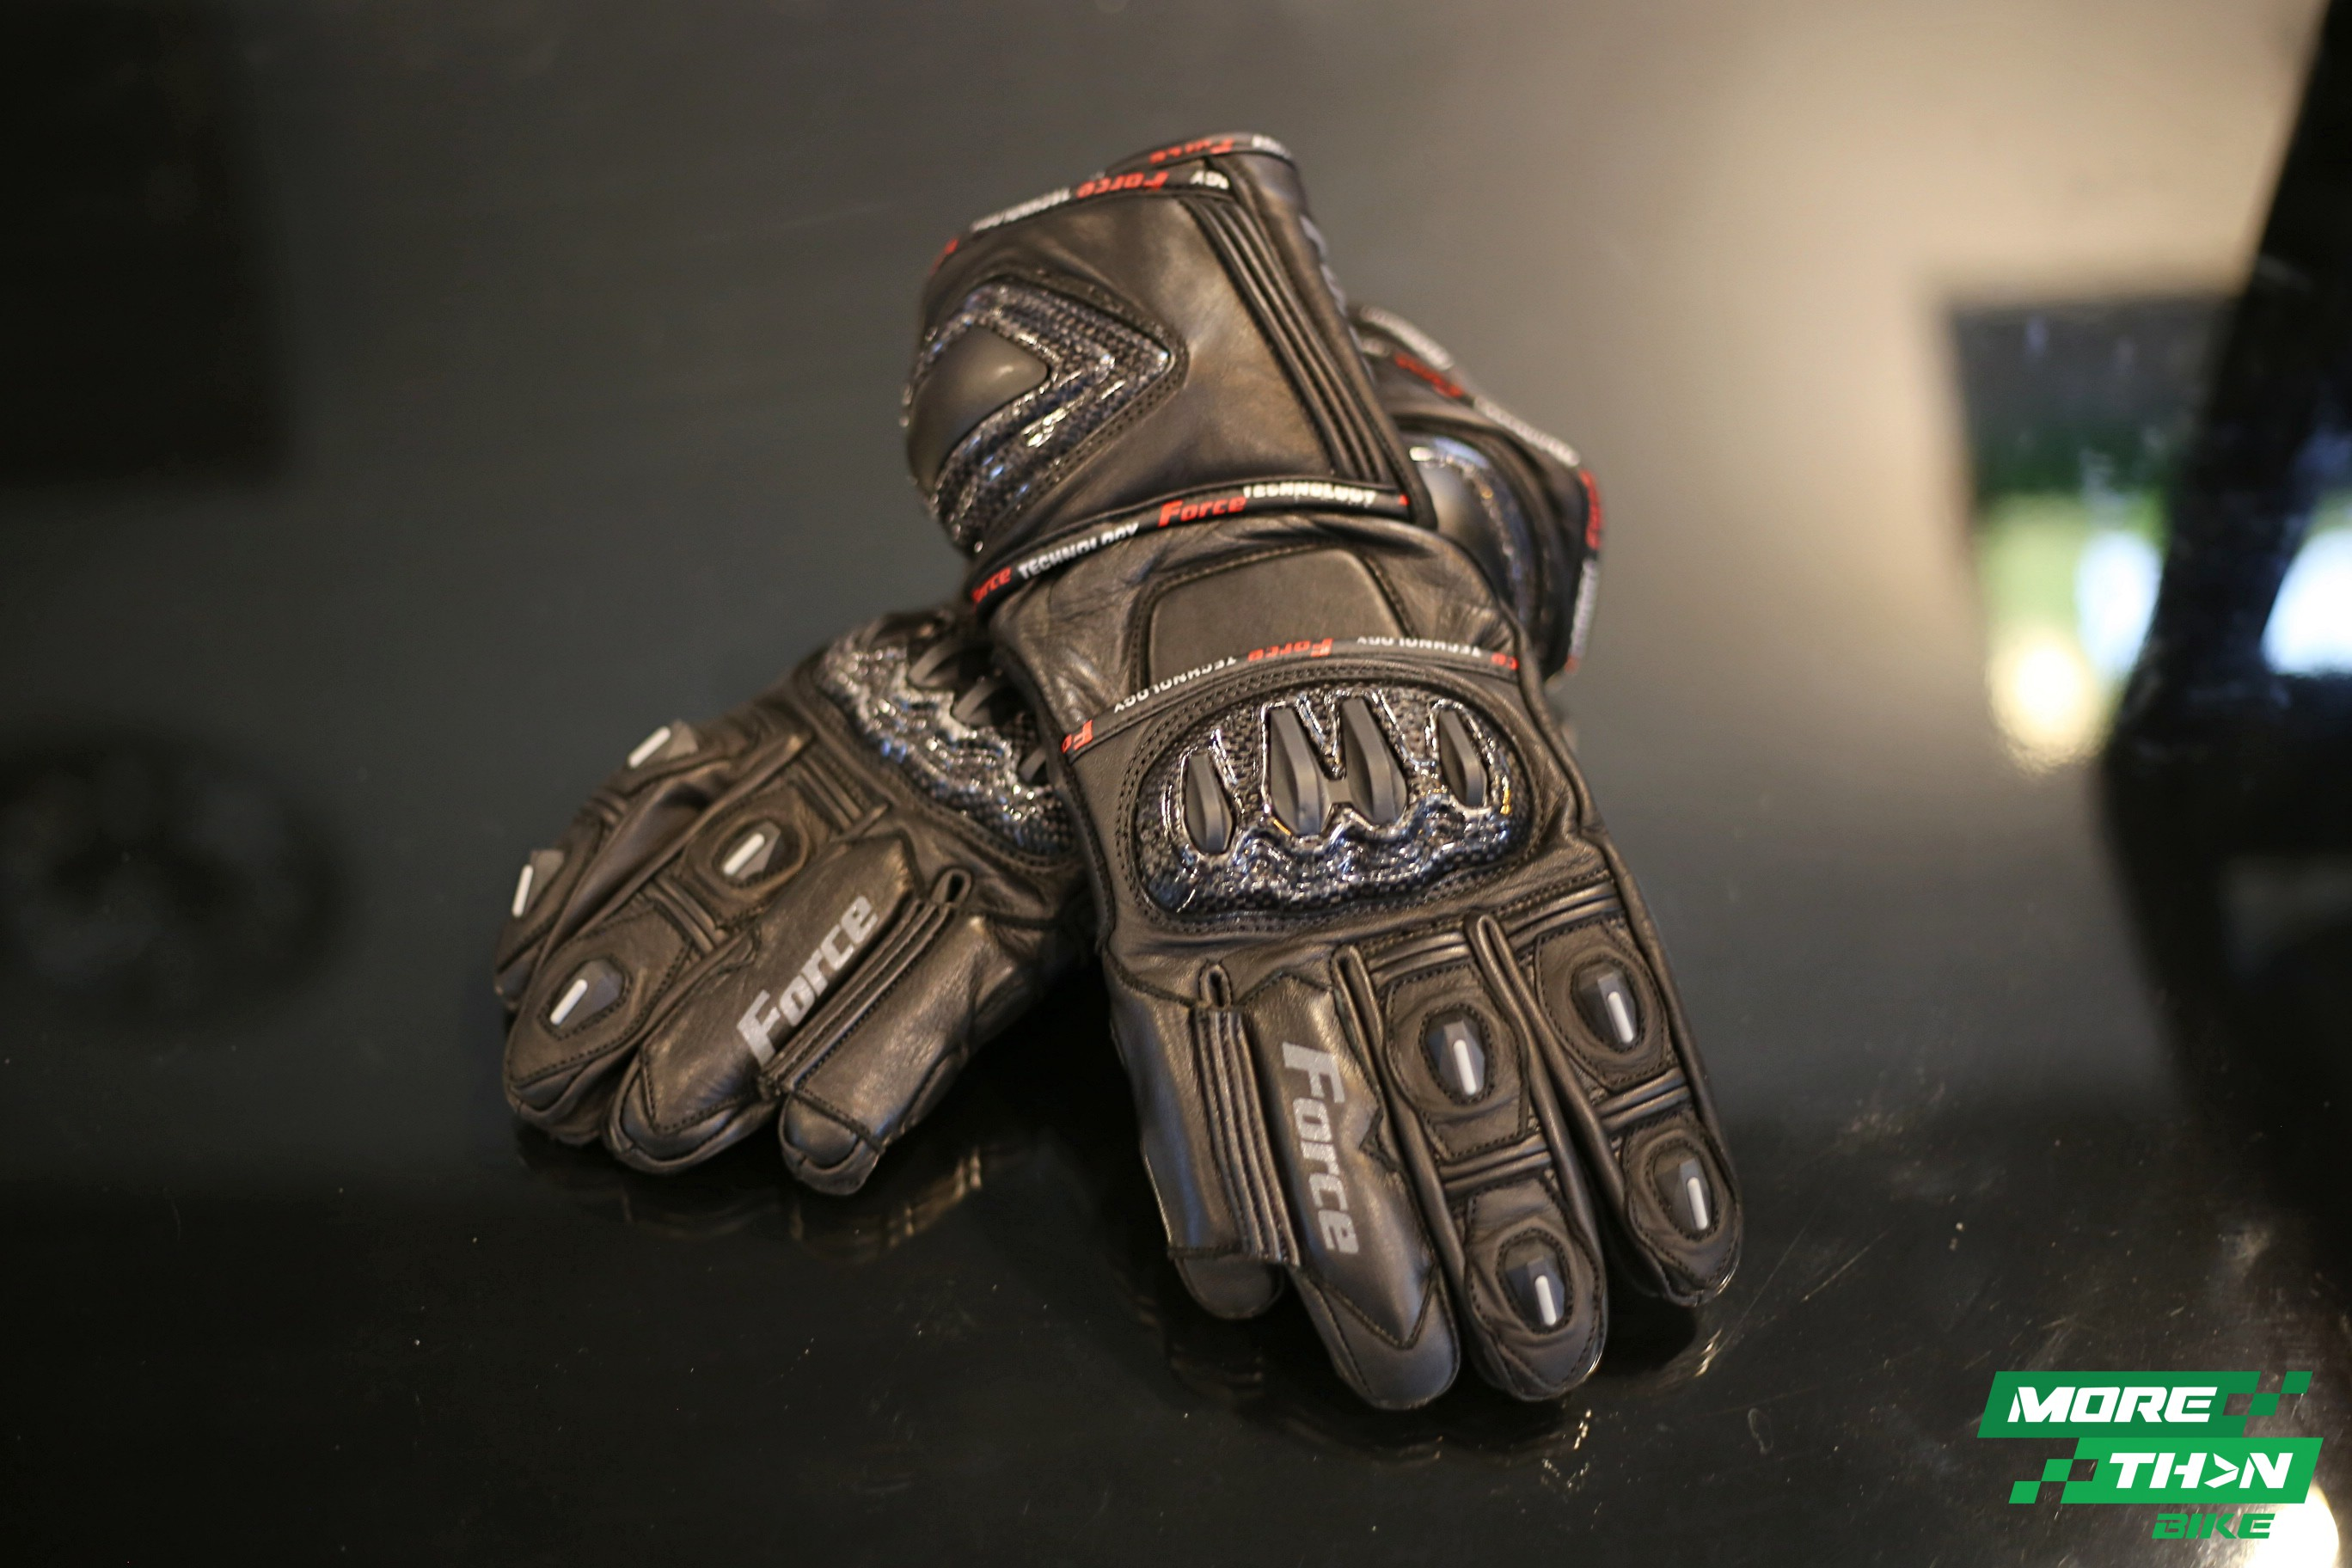 force-glove-race-pro-1